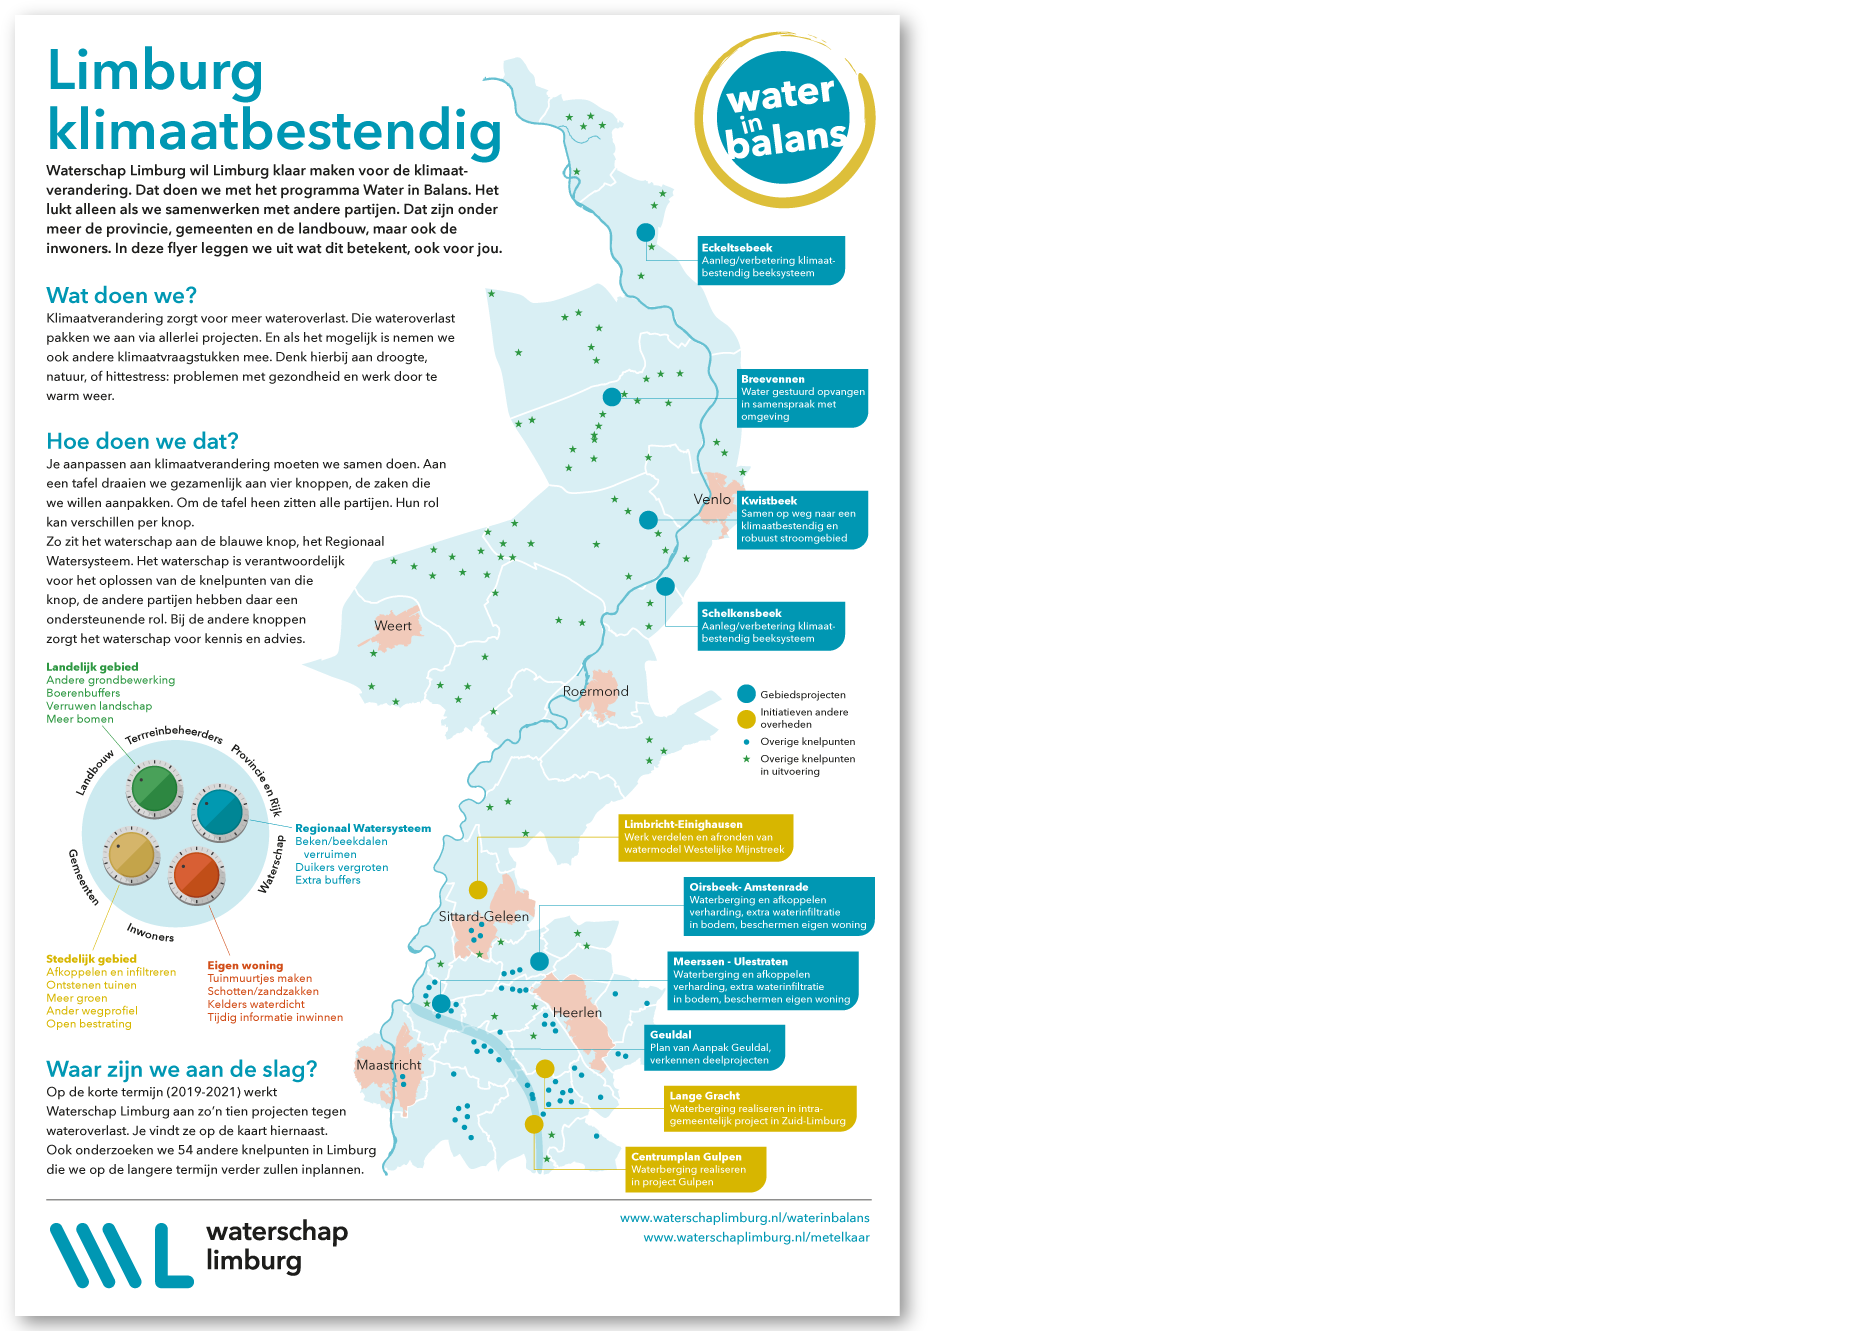 Limburg klimaatbestendig (Waterschap Limburg)